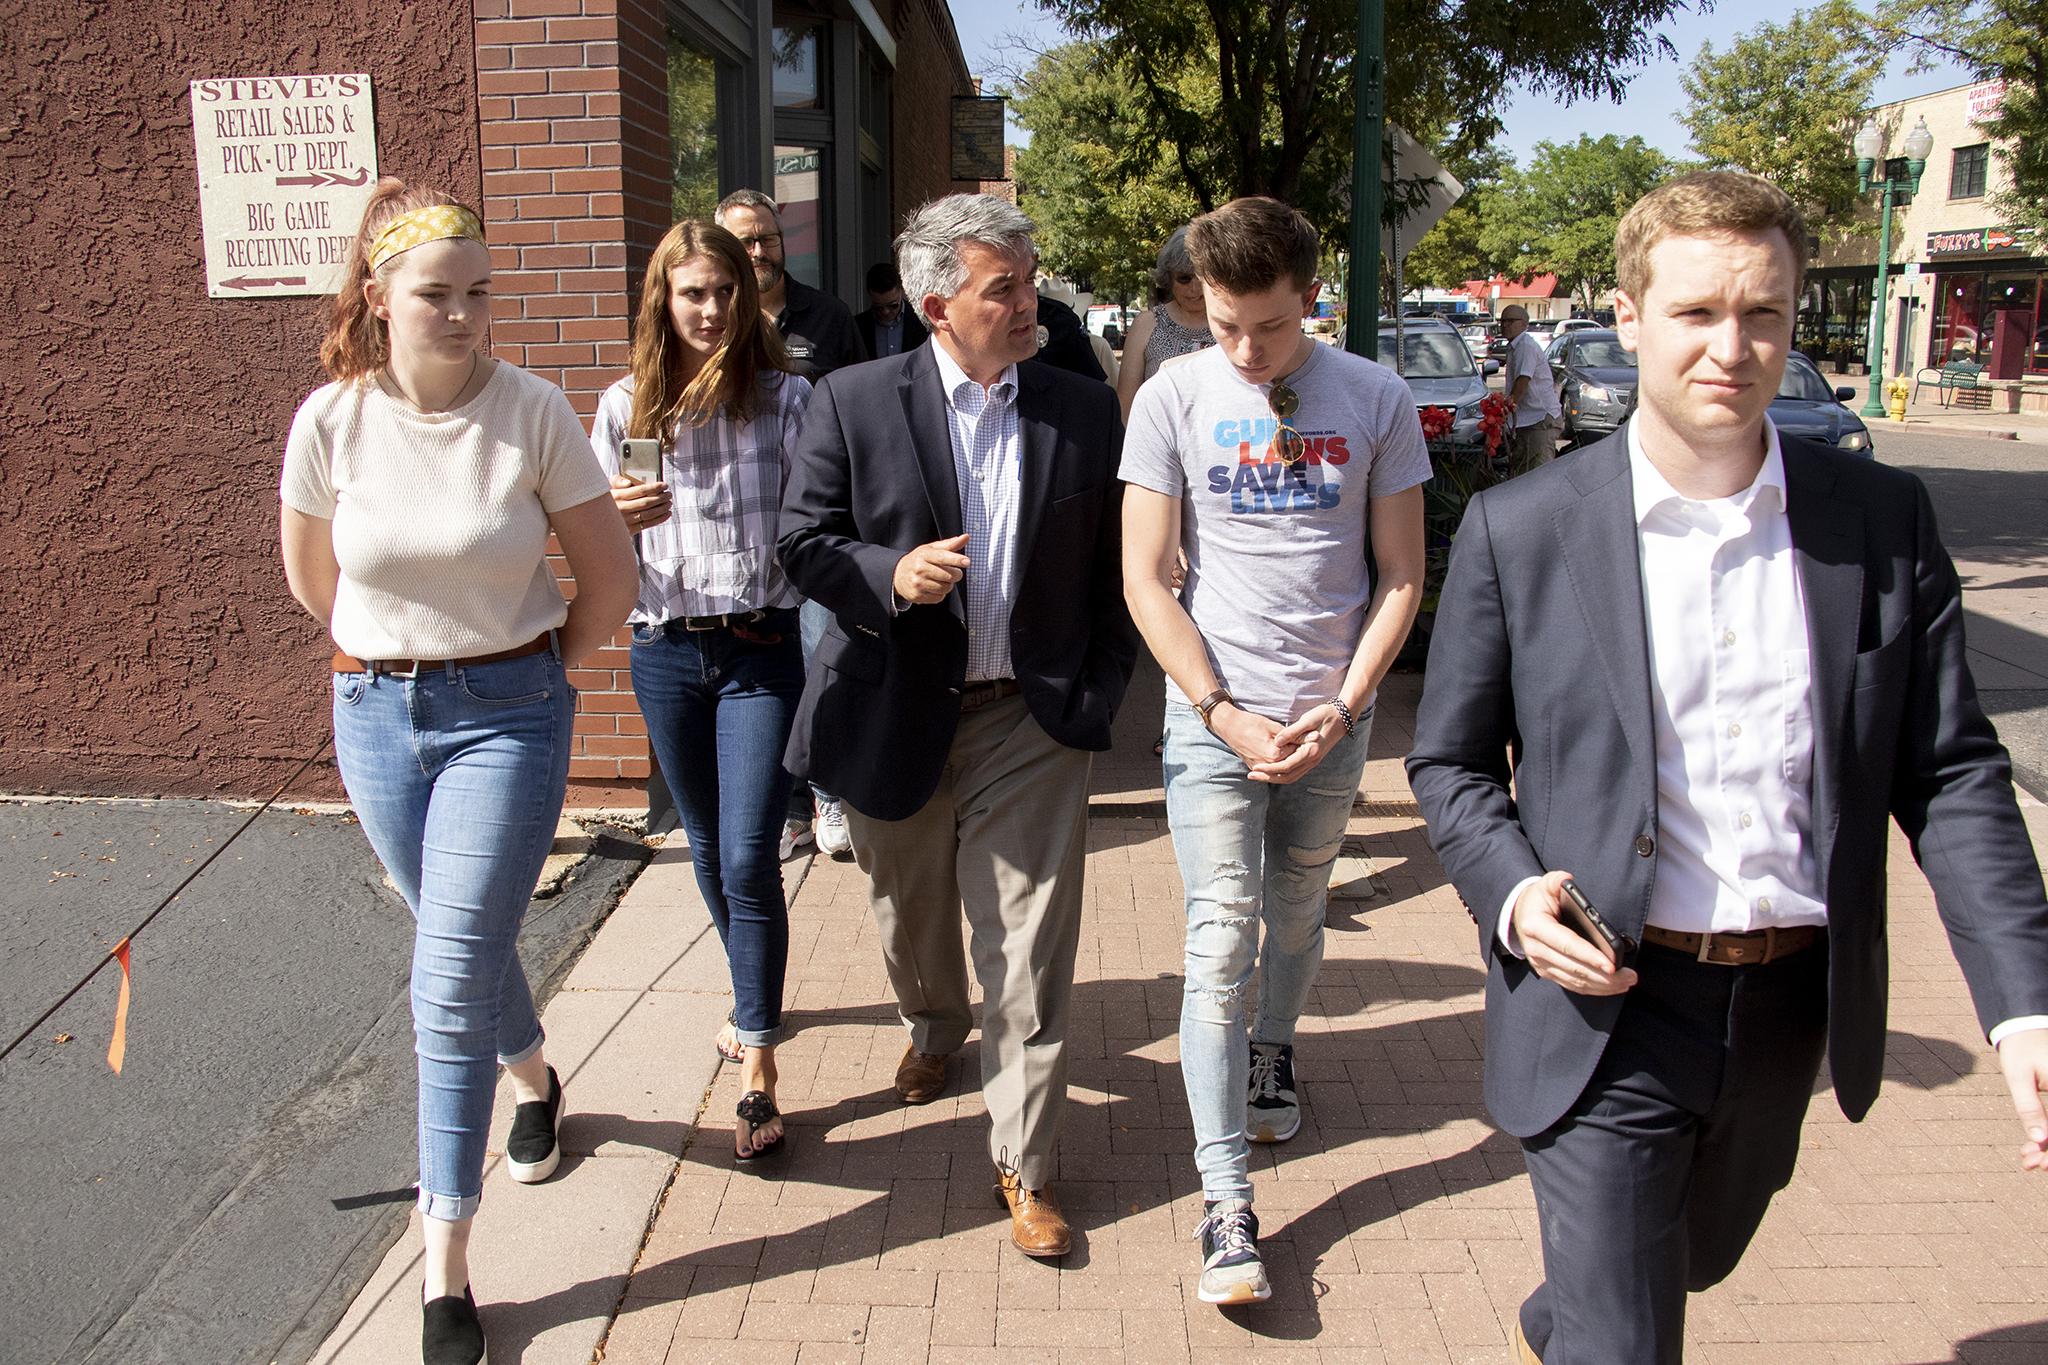 Sen. Cory Gardner visits Arvada, Aug. 13, 2019. (Kevin J. Beaty/Denverite)